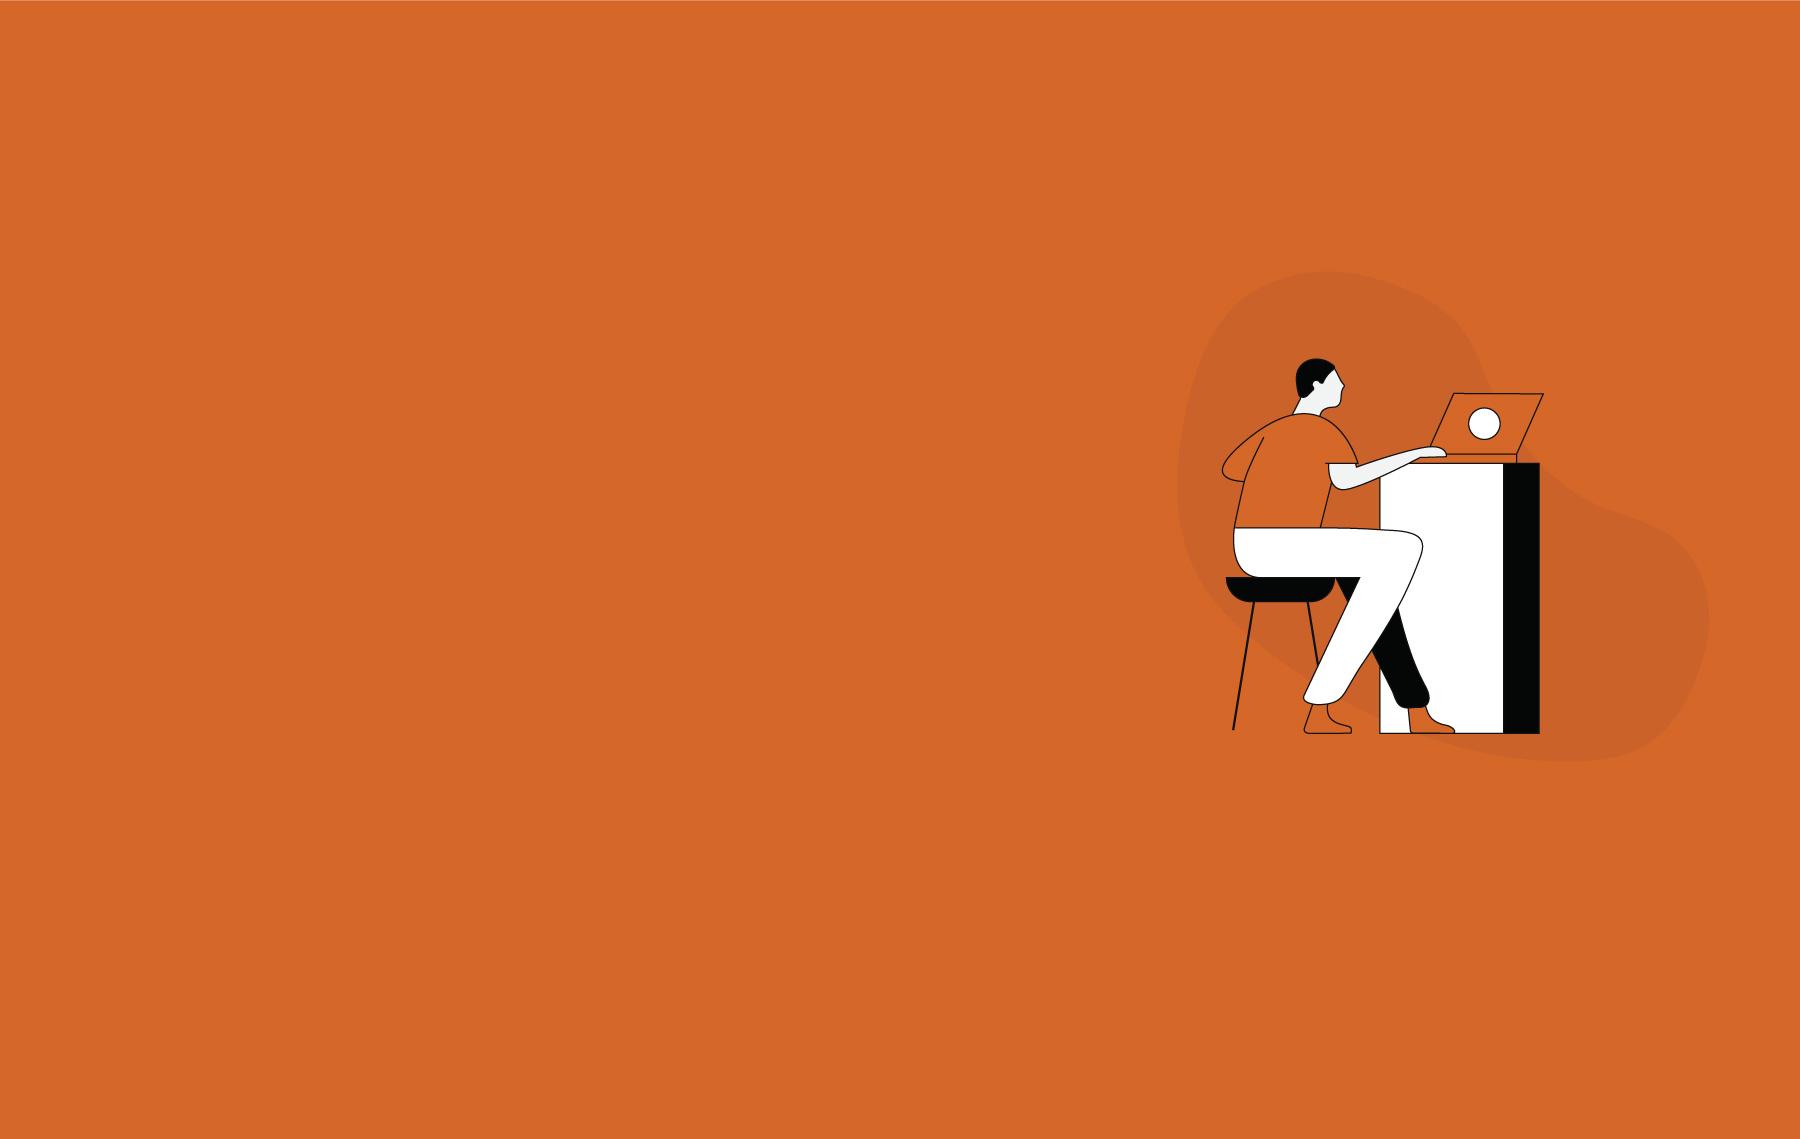 Illustration of man conducting virtual remote workshop